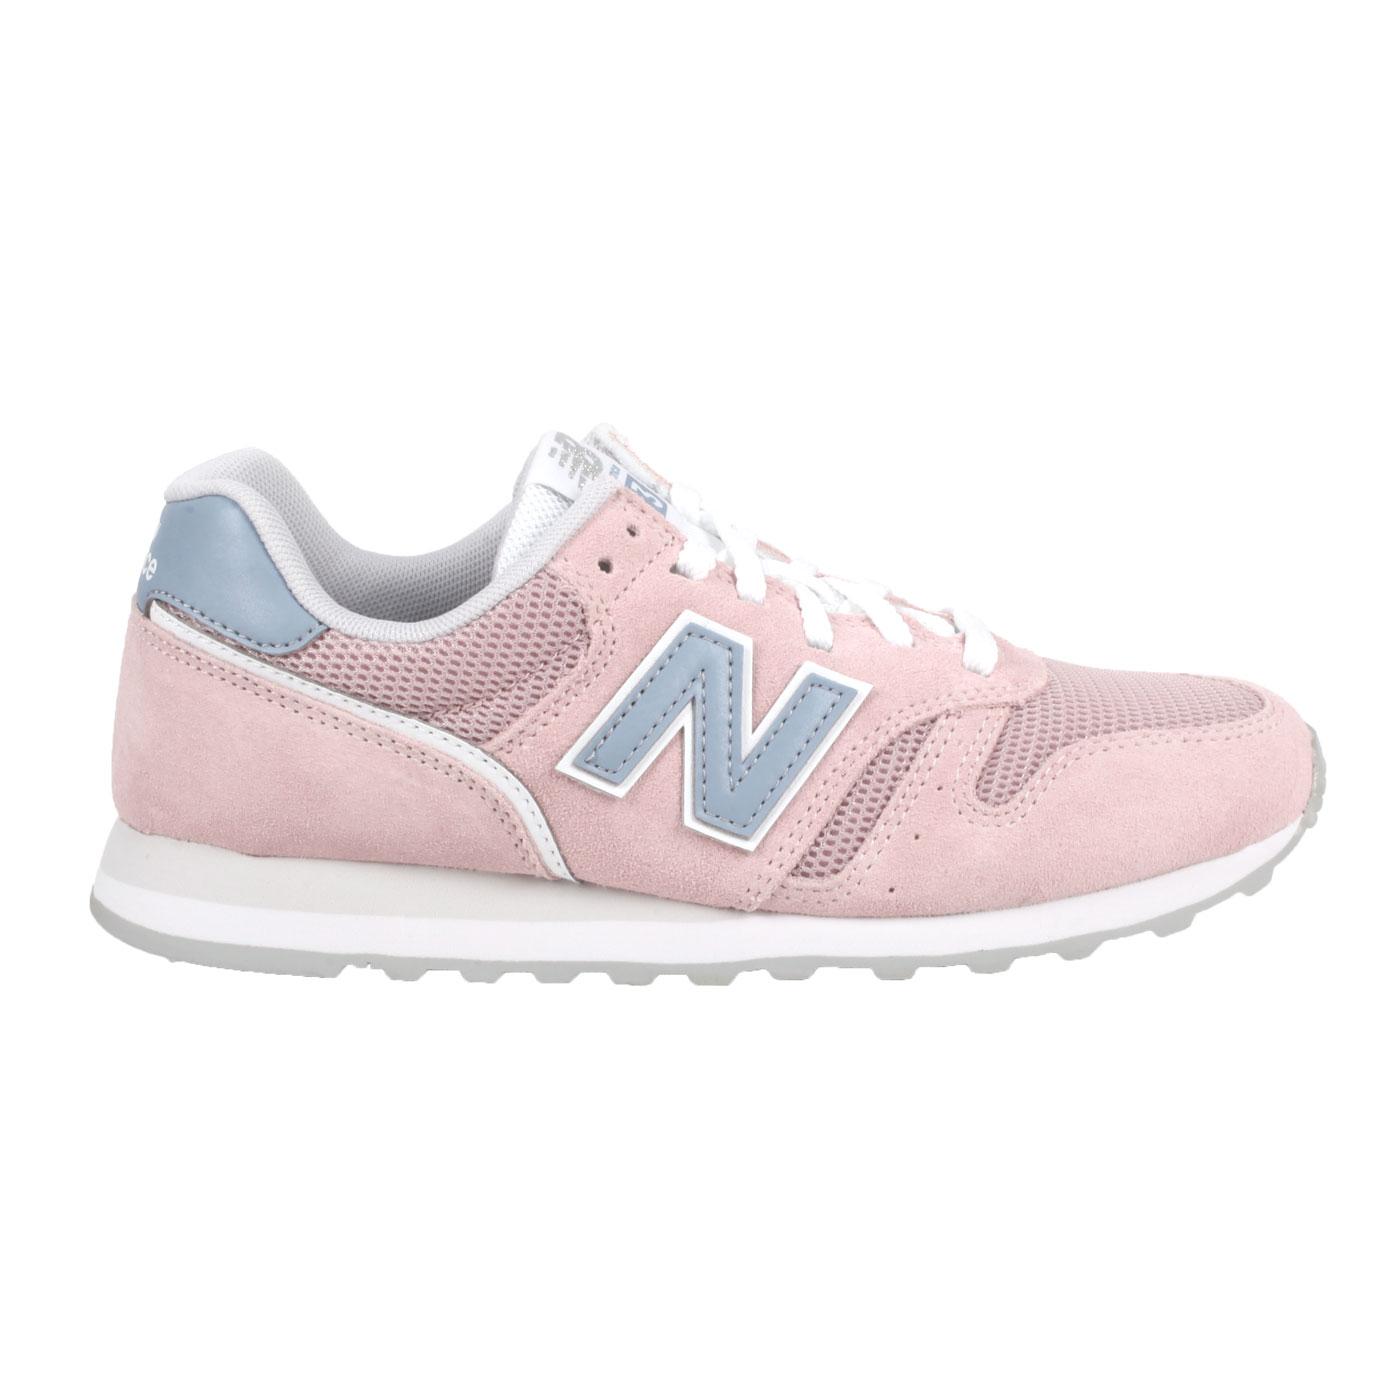 NEW BALANCE 女款休閒運動鞋 WL373DC2 - 粉白灰藍